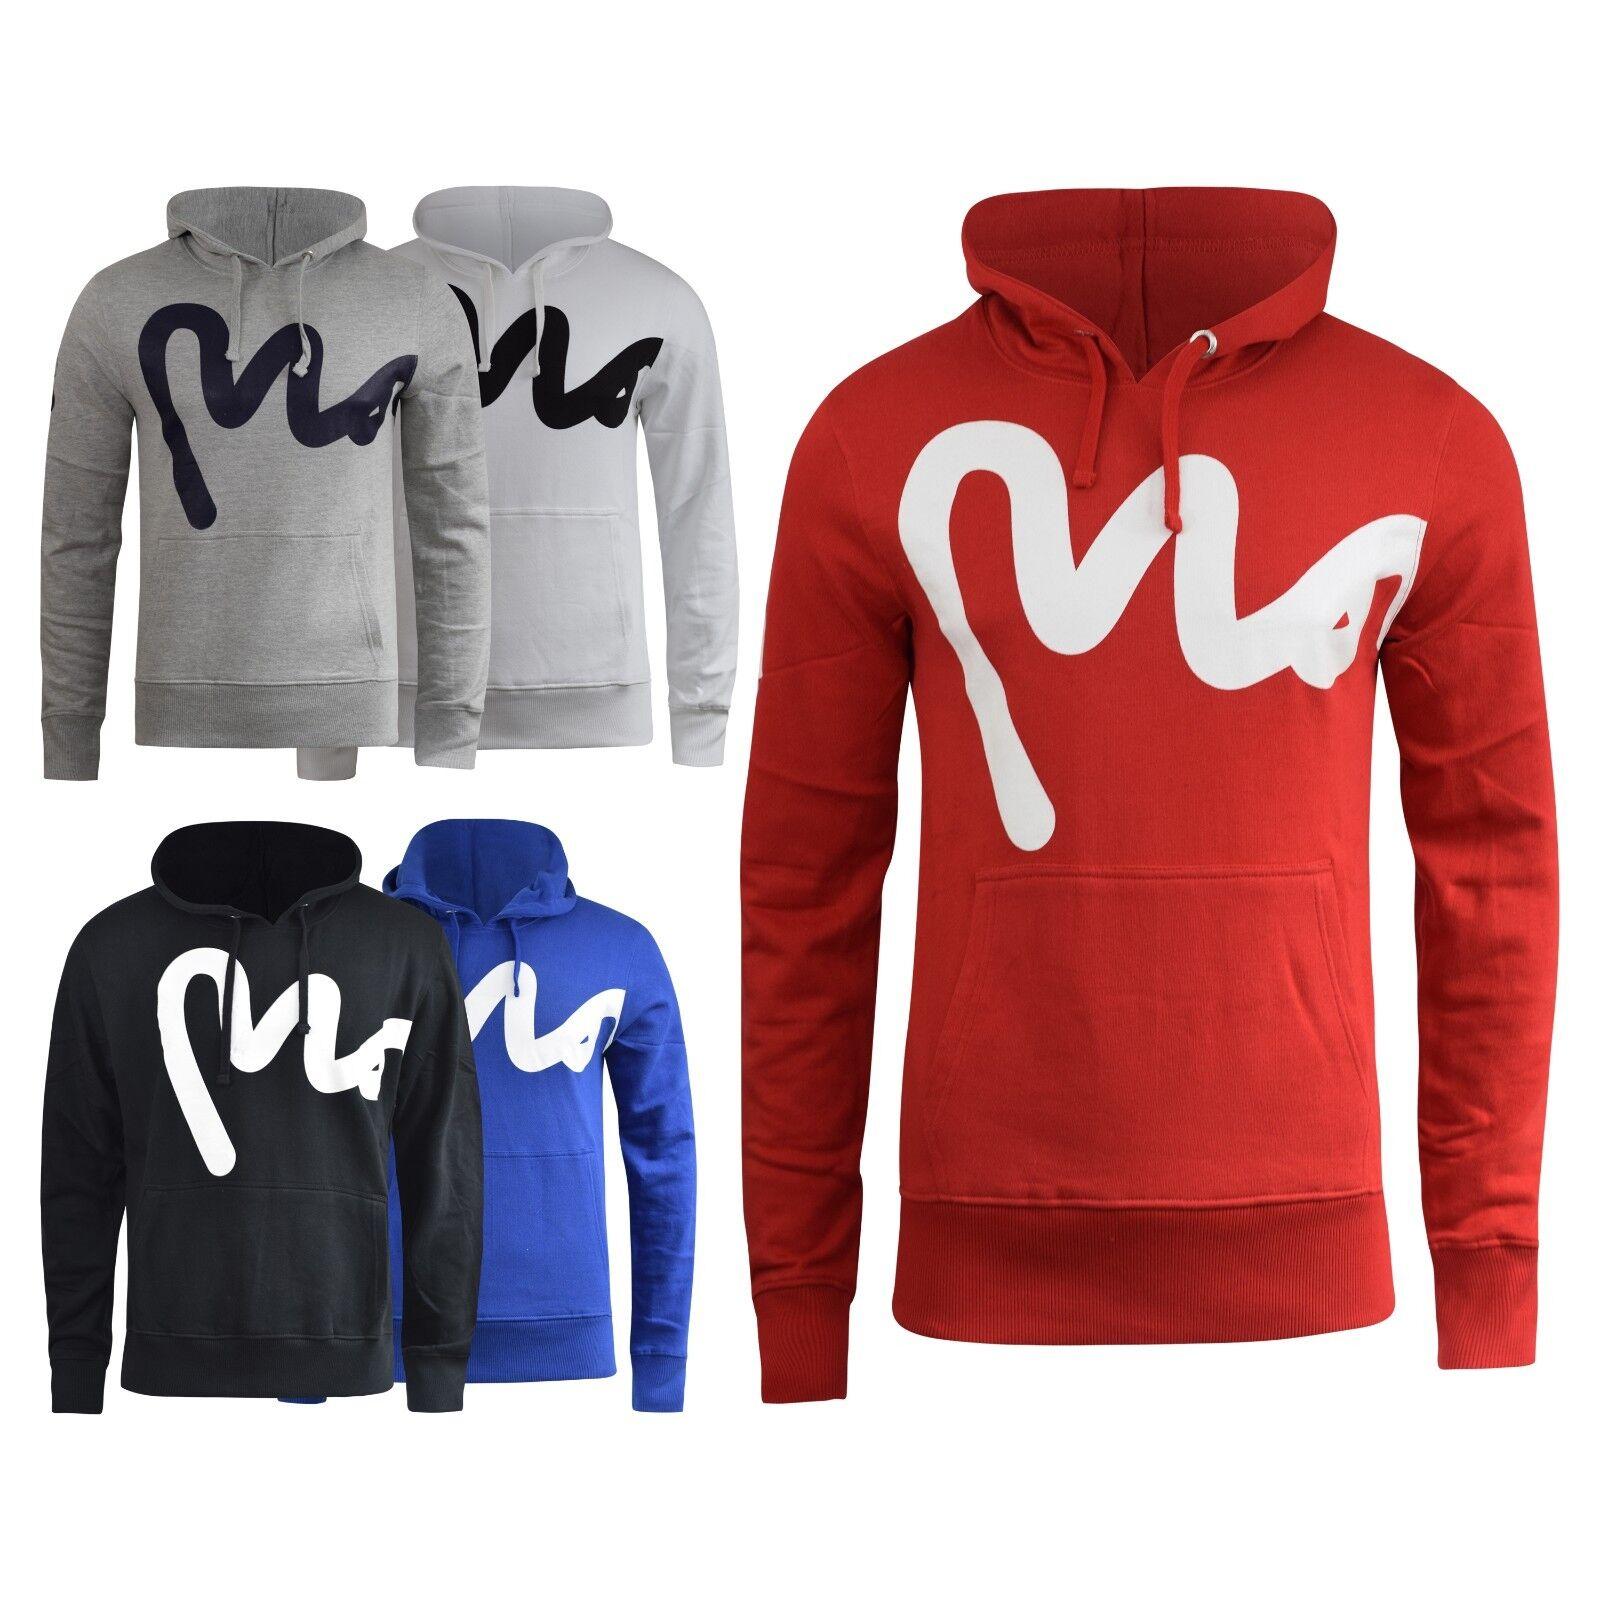 Herren Kapuzenpullover Money Kleidung groß Money Sweatshirt Pulli